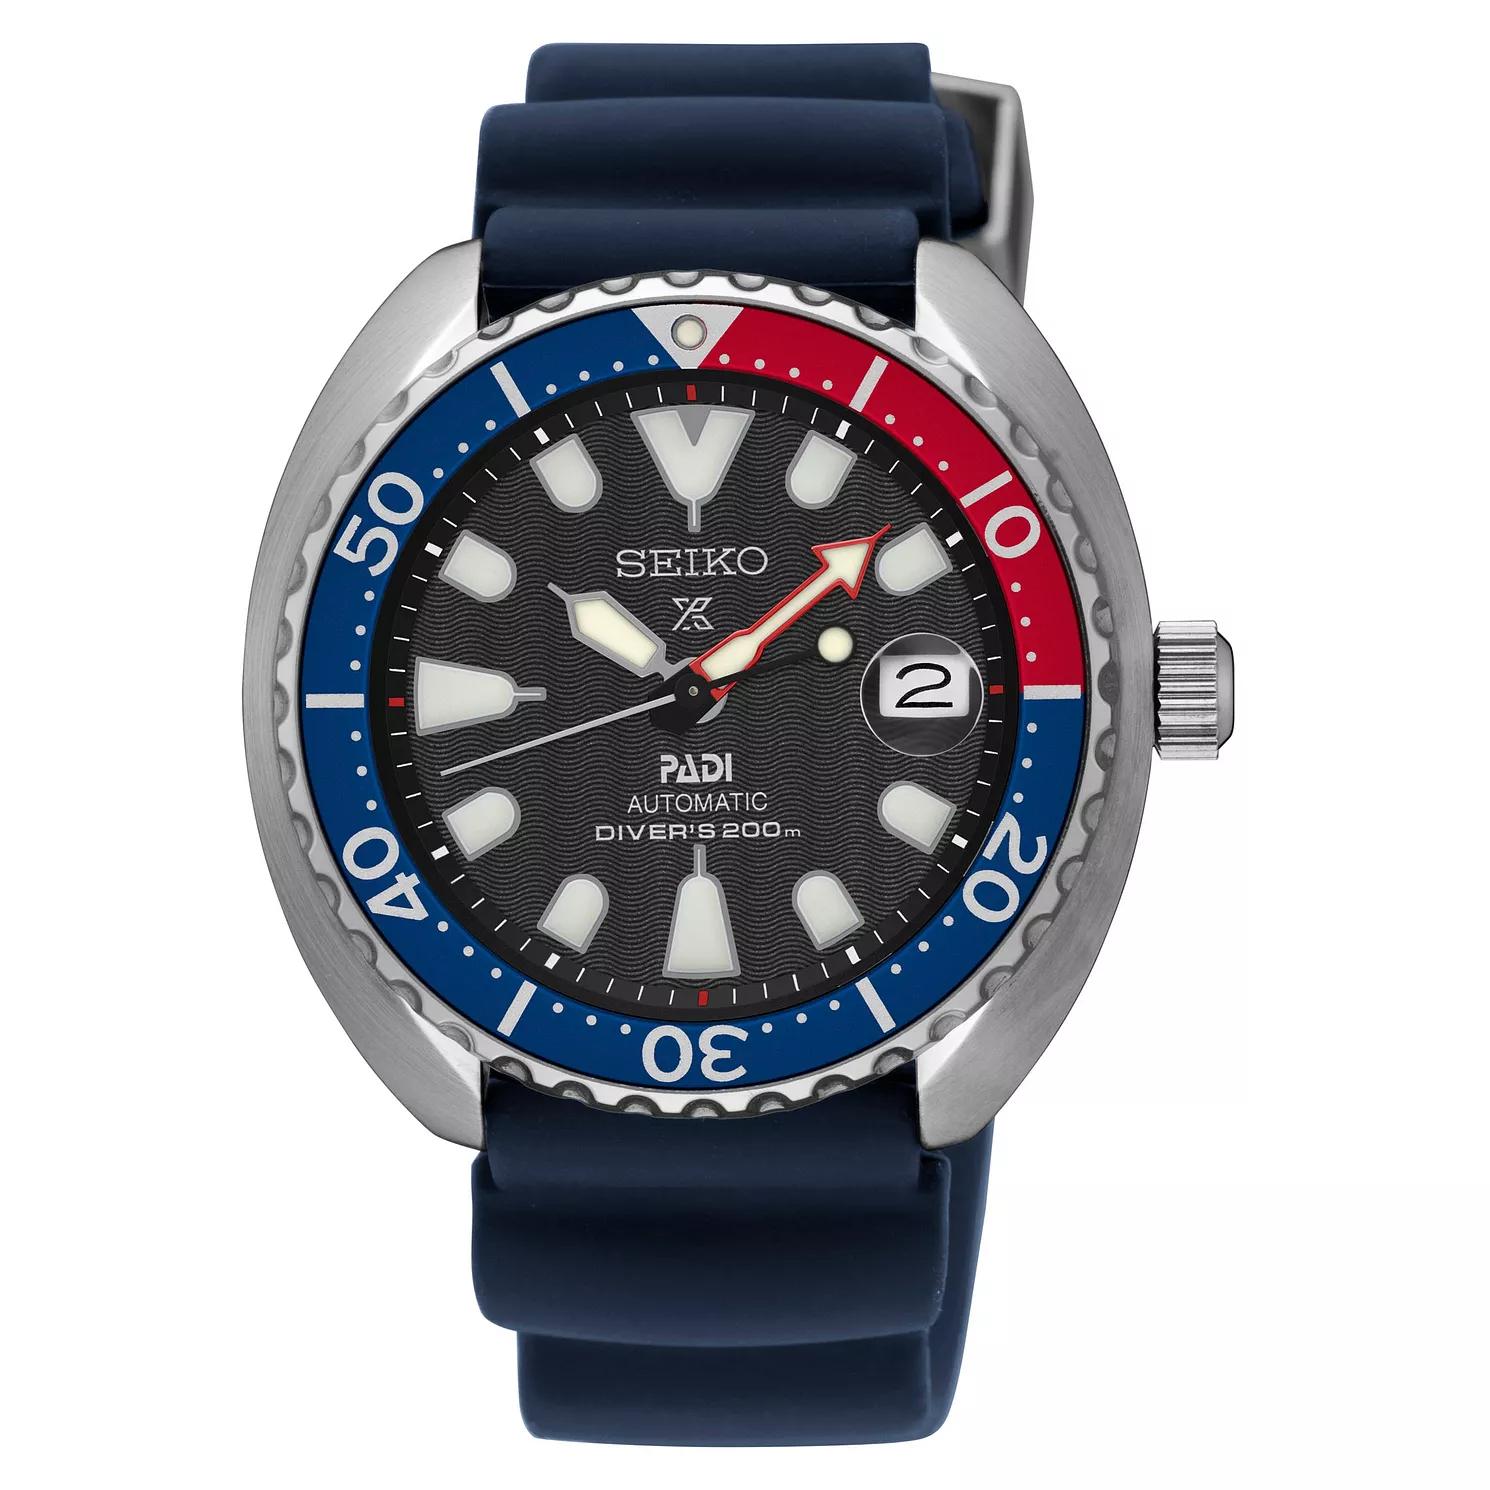 Seiko Prospex PADI Men's Blue Silicone Strap Watch SRPC41K1 - £259 @ Ernest Jones